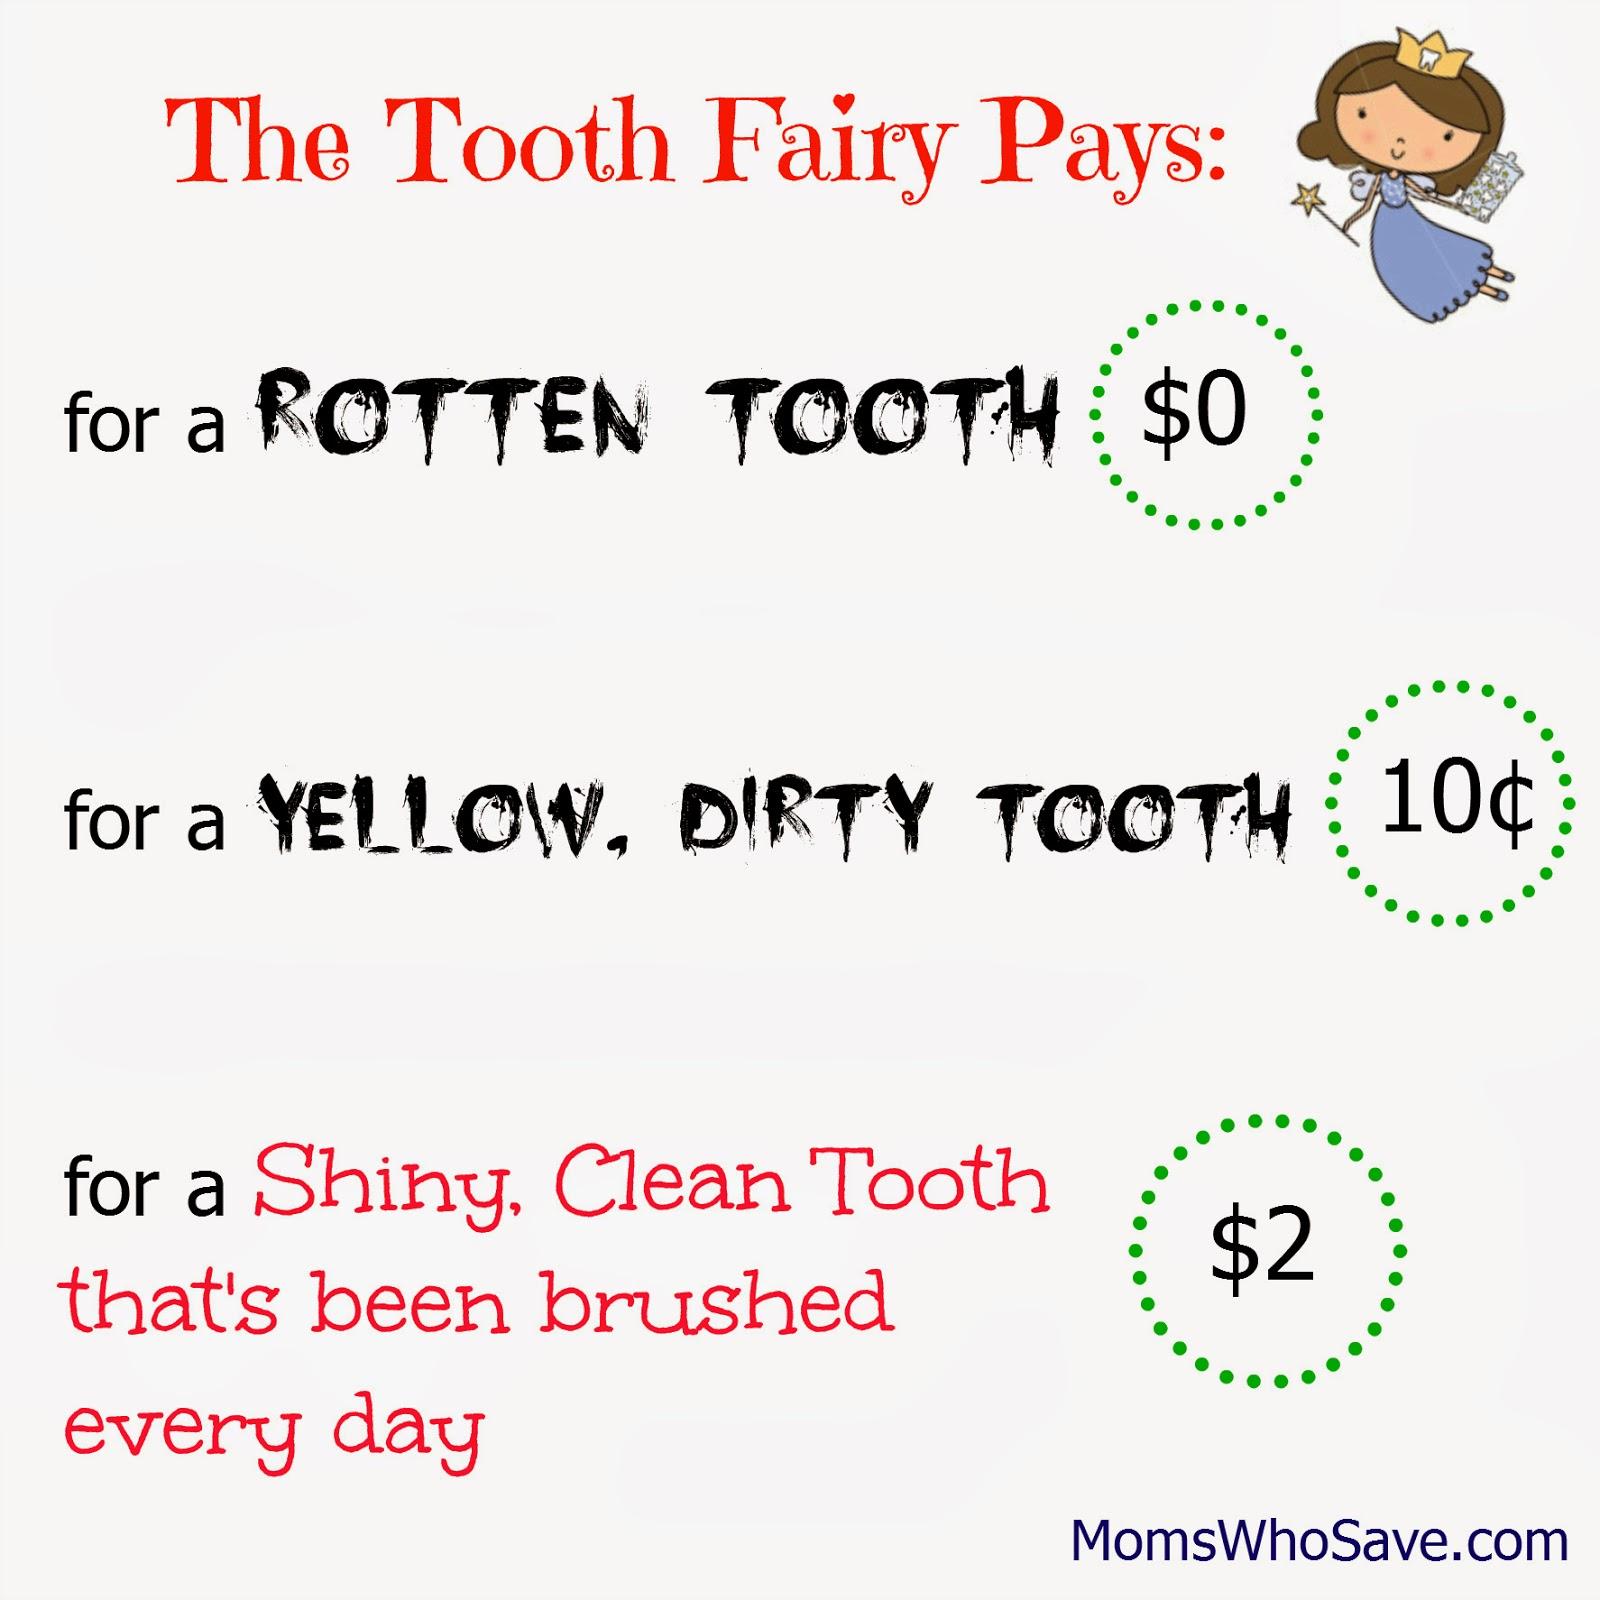 Tooth Fairy Chart - MomsWhoSave.com